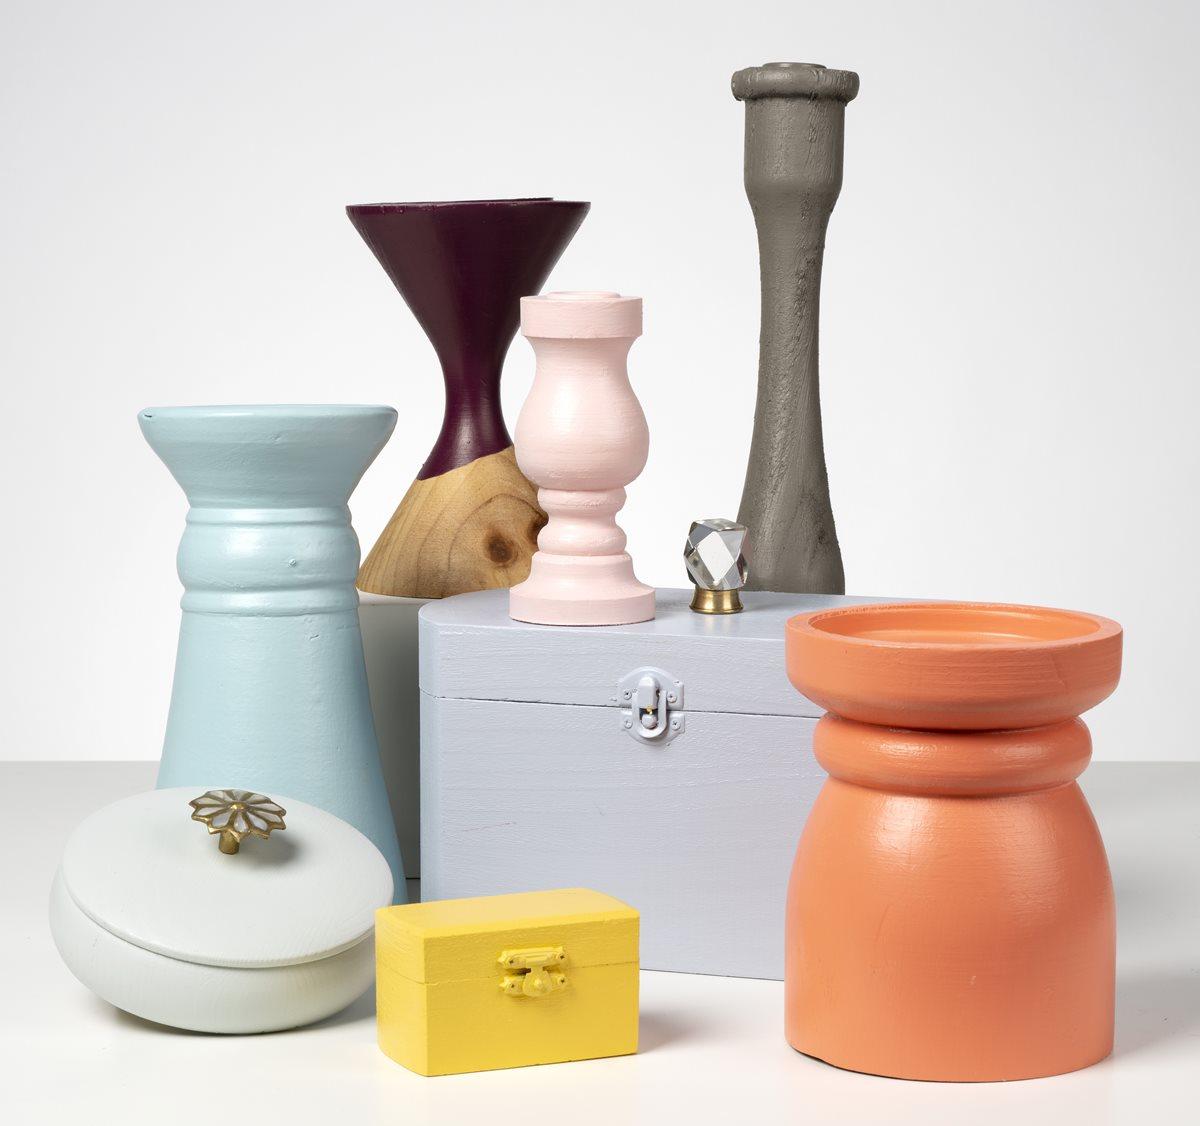 FolkArt One Decor Candlesticks and Trinket Boxes